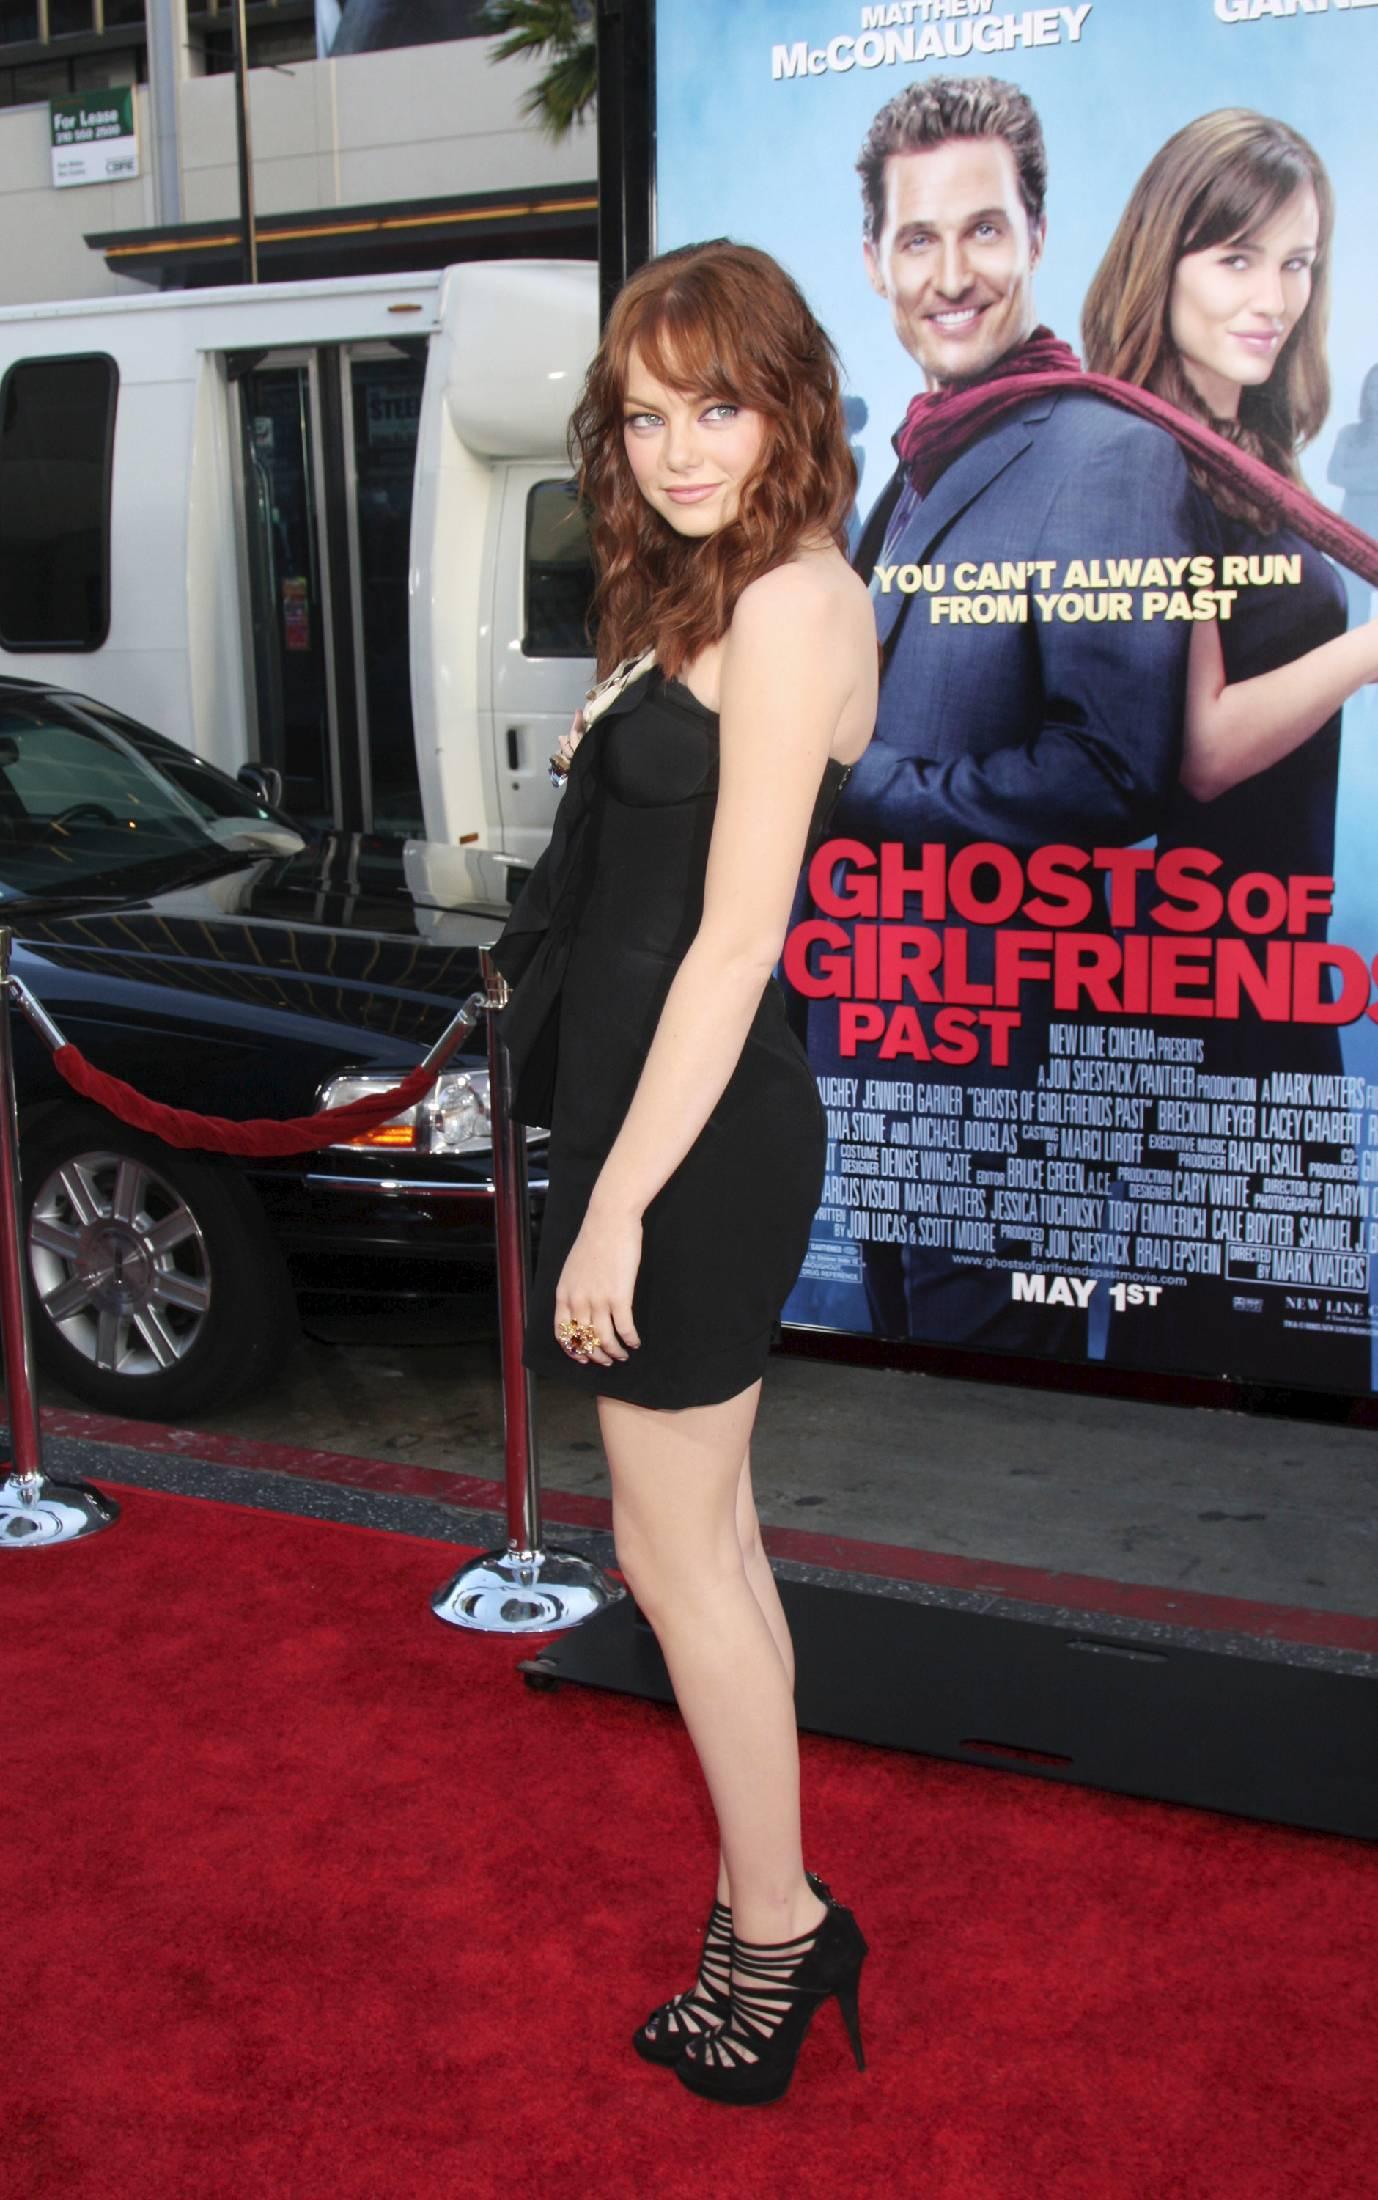 27655_emma_stone_ghosts_of_girlfriends_past_premiere_tikipeter_celebritycity_004_122_60lo.jpg